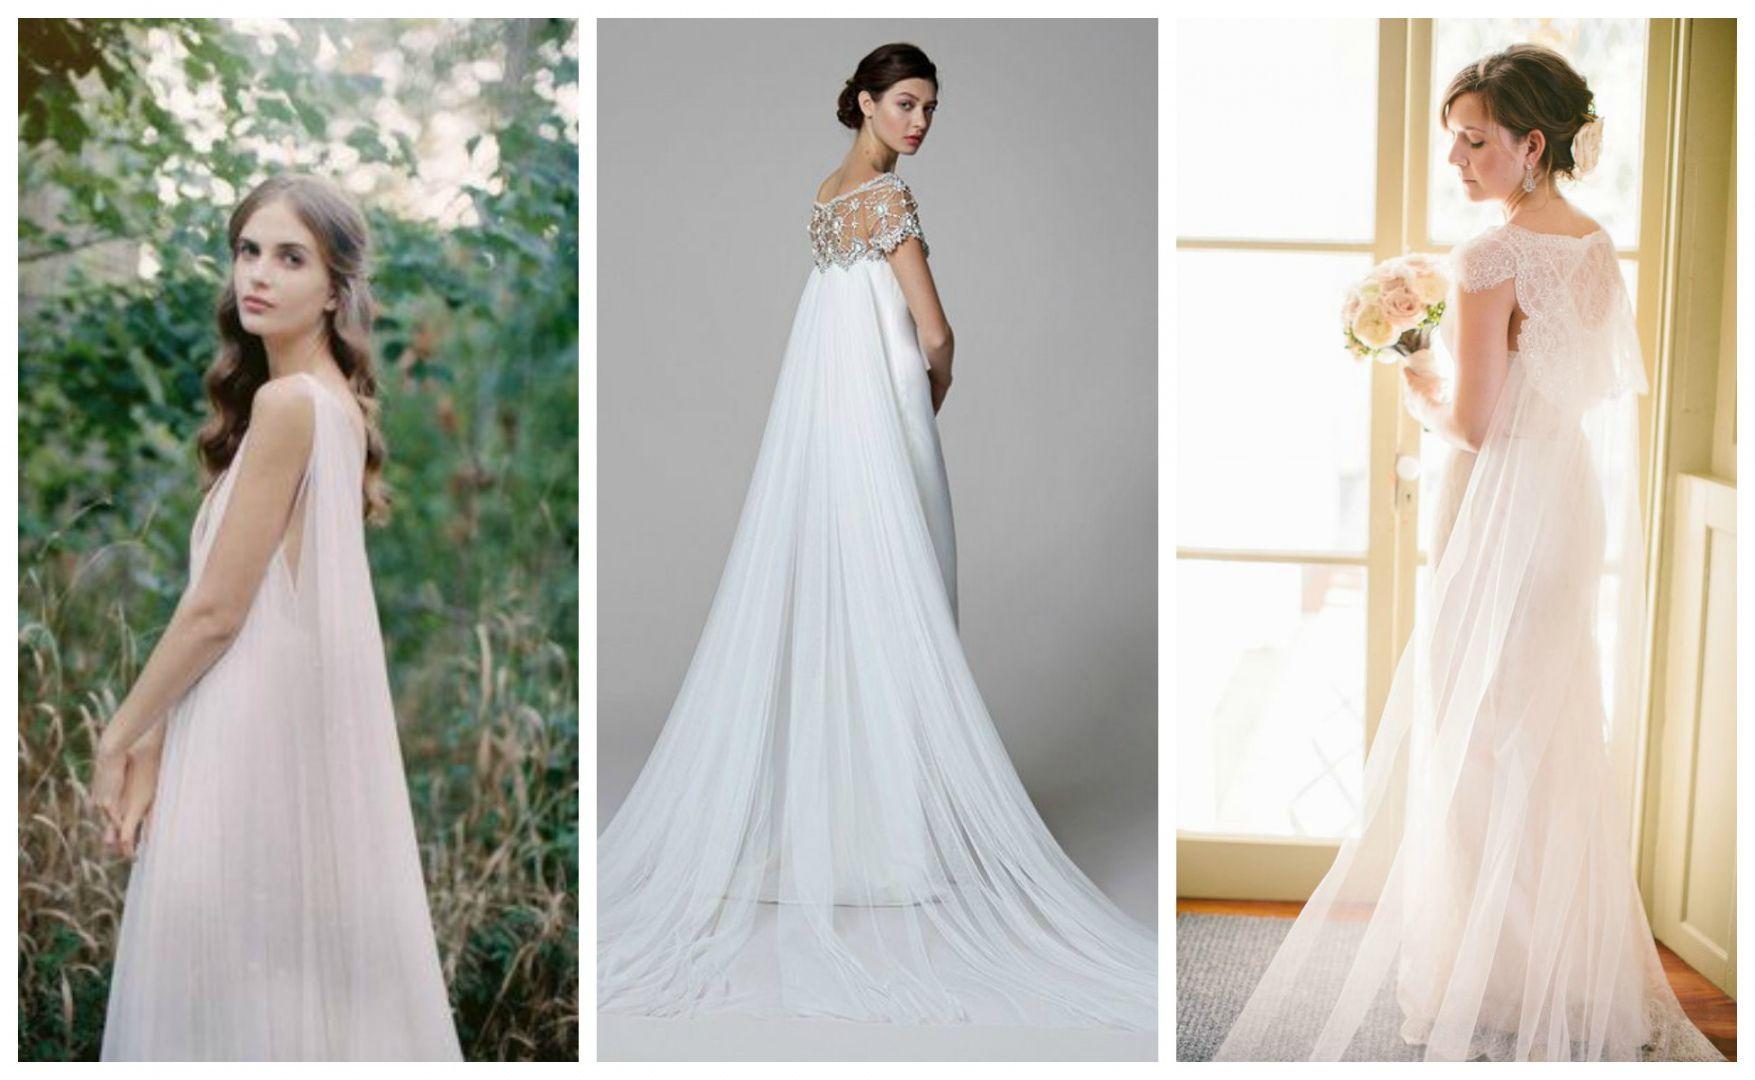 Pin Oleh Jooana Di Wedding Ideas For You Pinterest Wedding